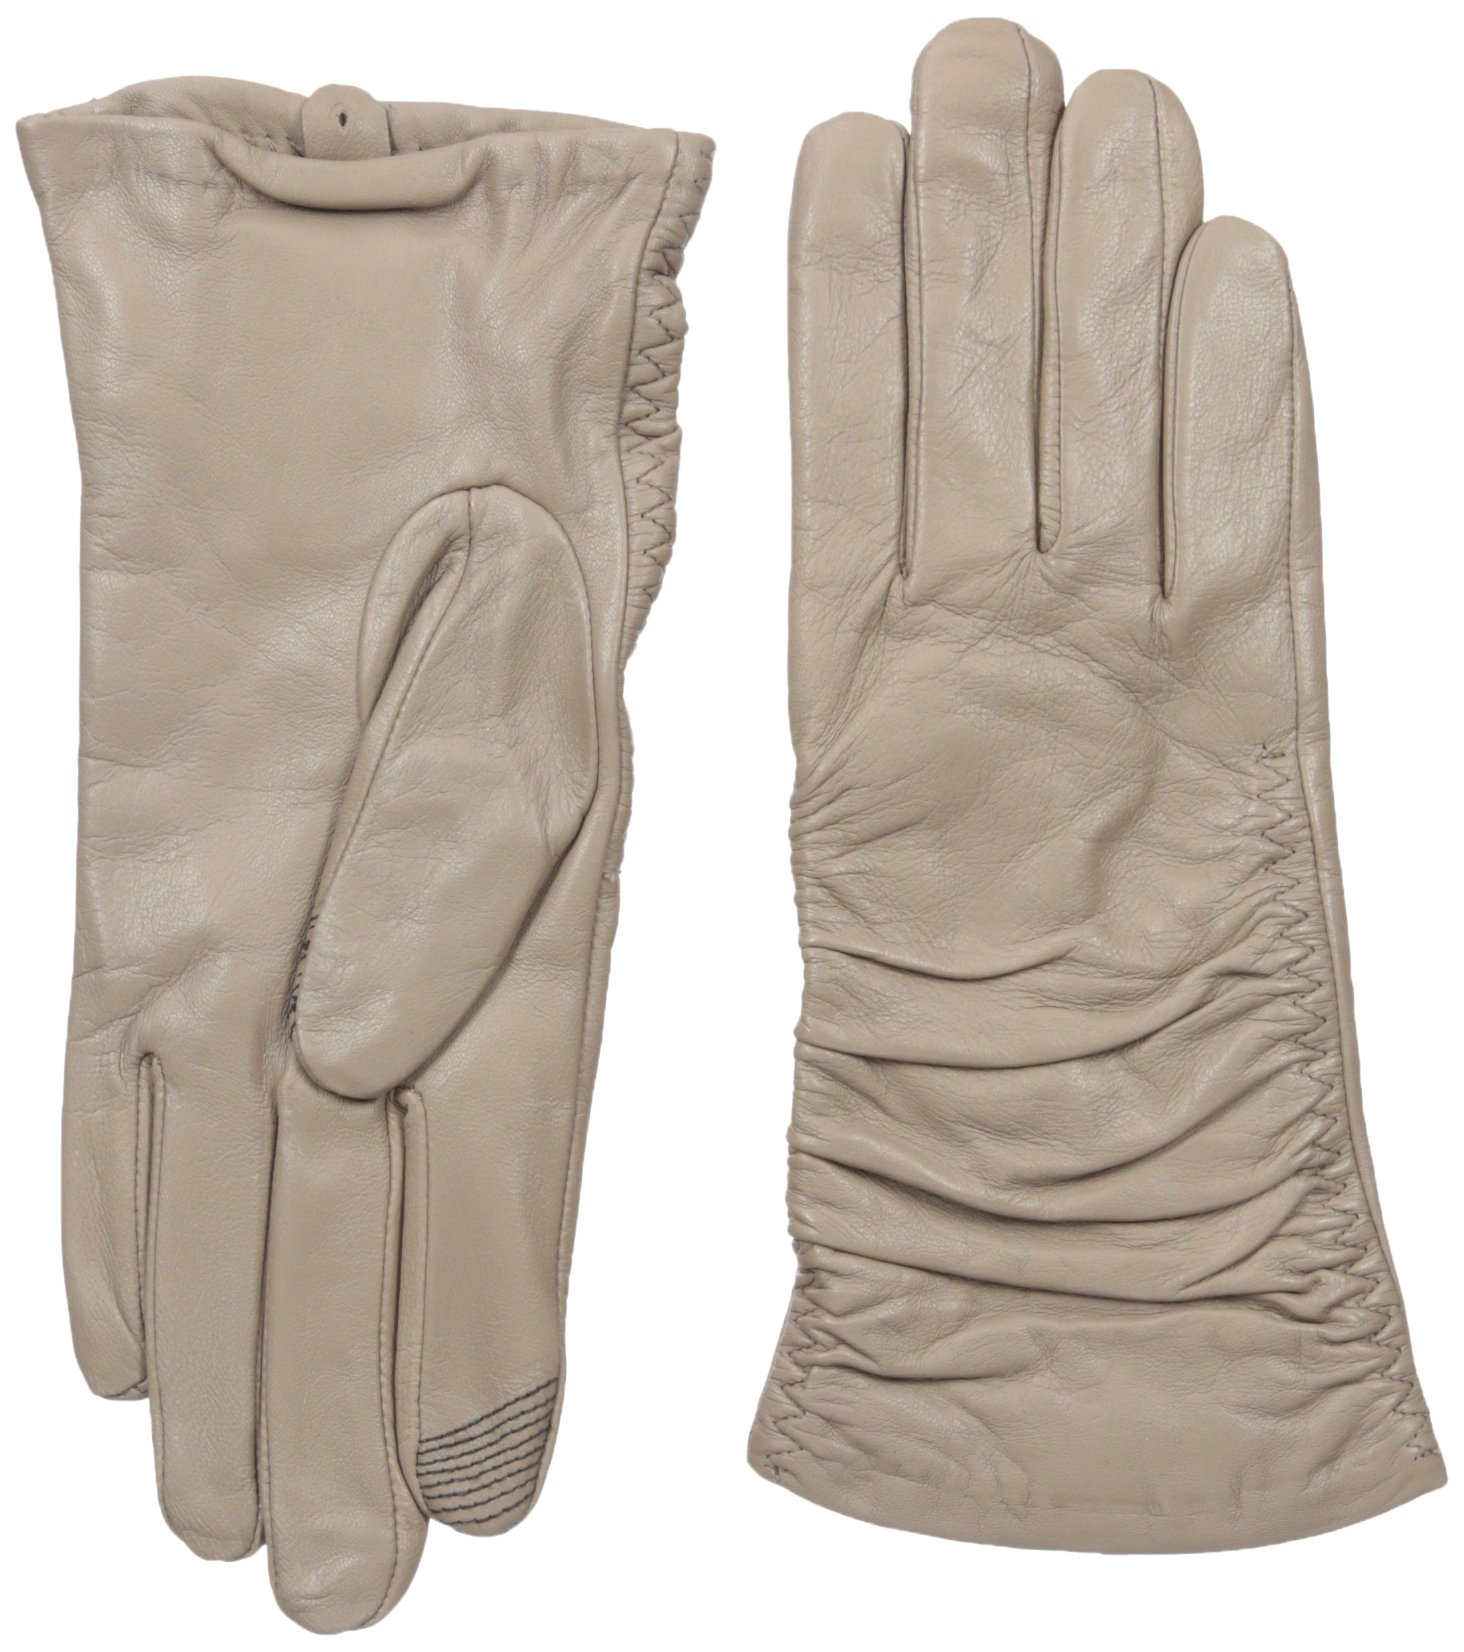 Adrienne Vittadini Women's Supple Leather Touchscreen Gloves, Mushroom, Large